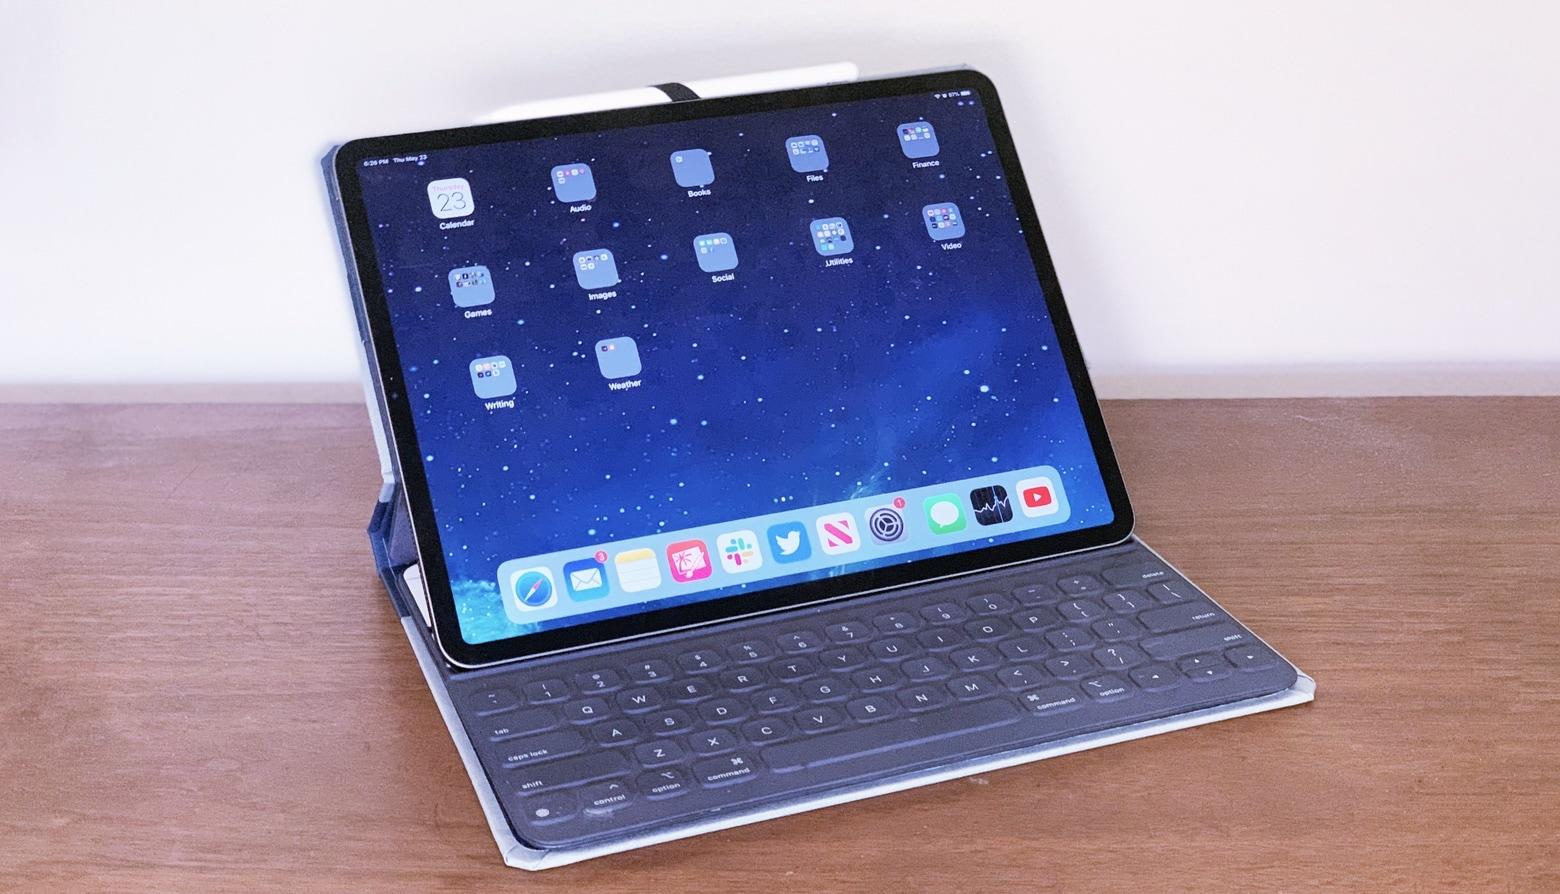 Dodocase Keyboard Folio Sleeve review